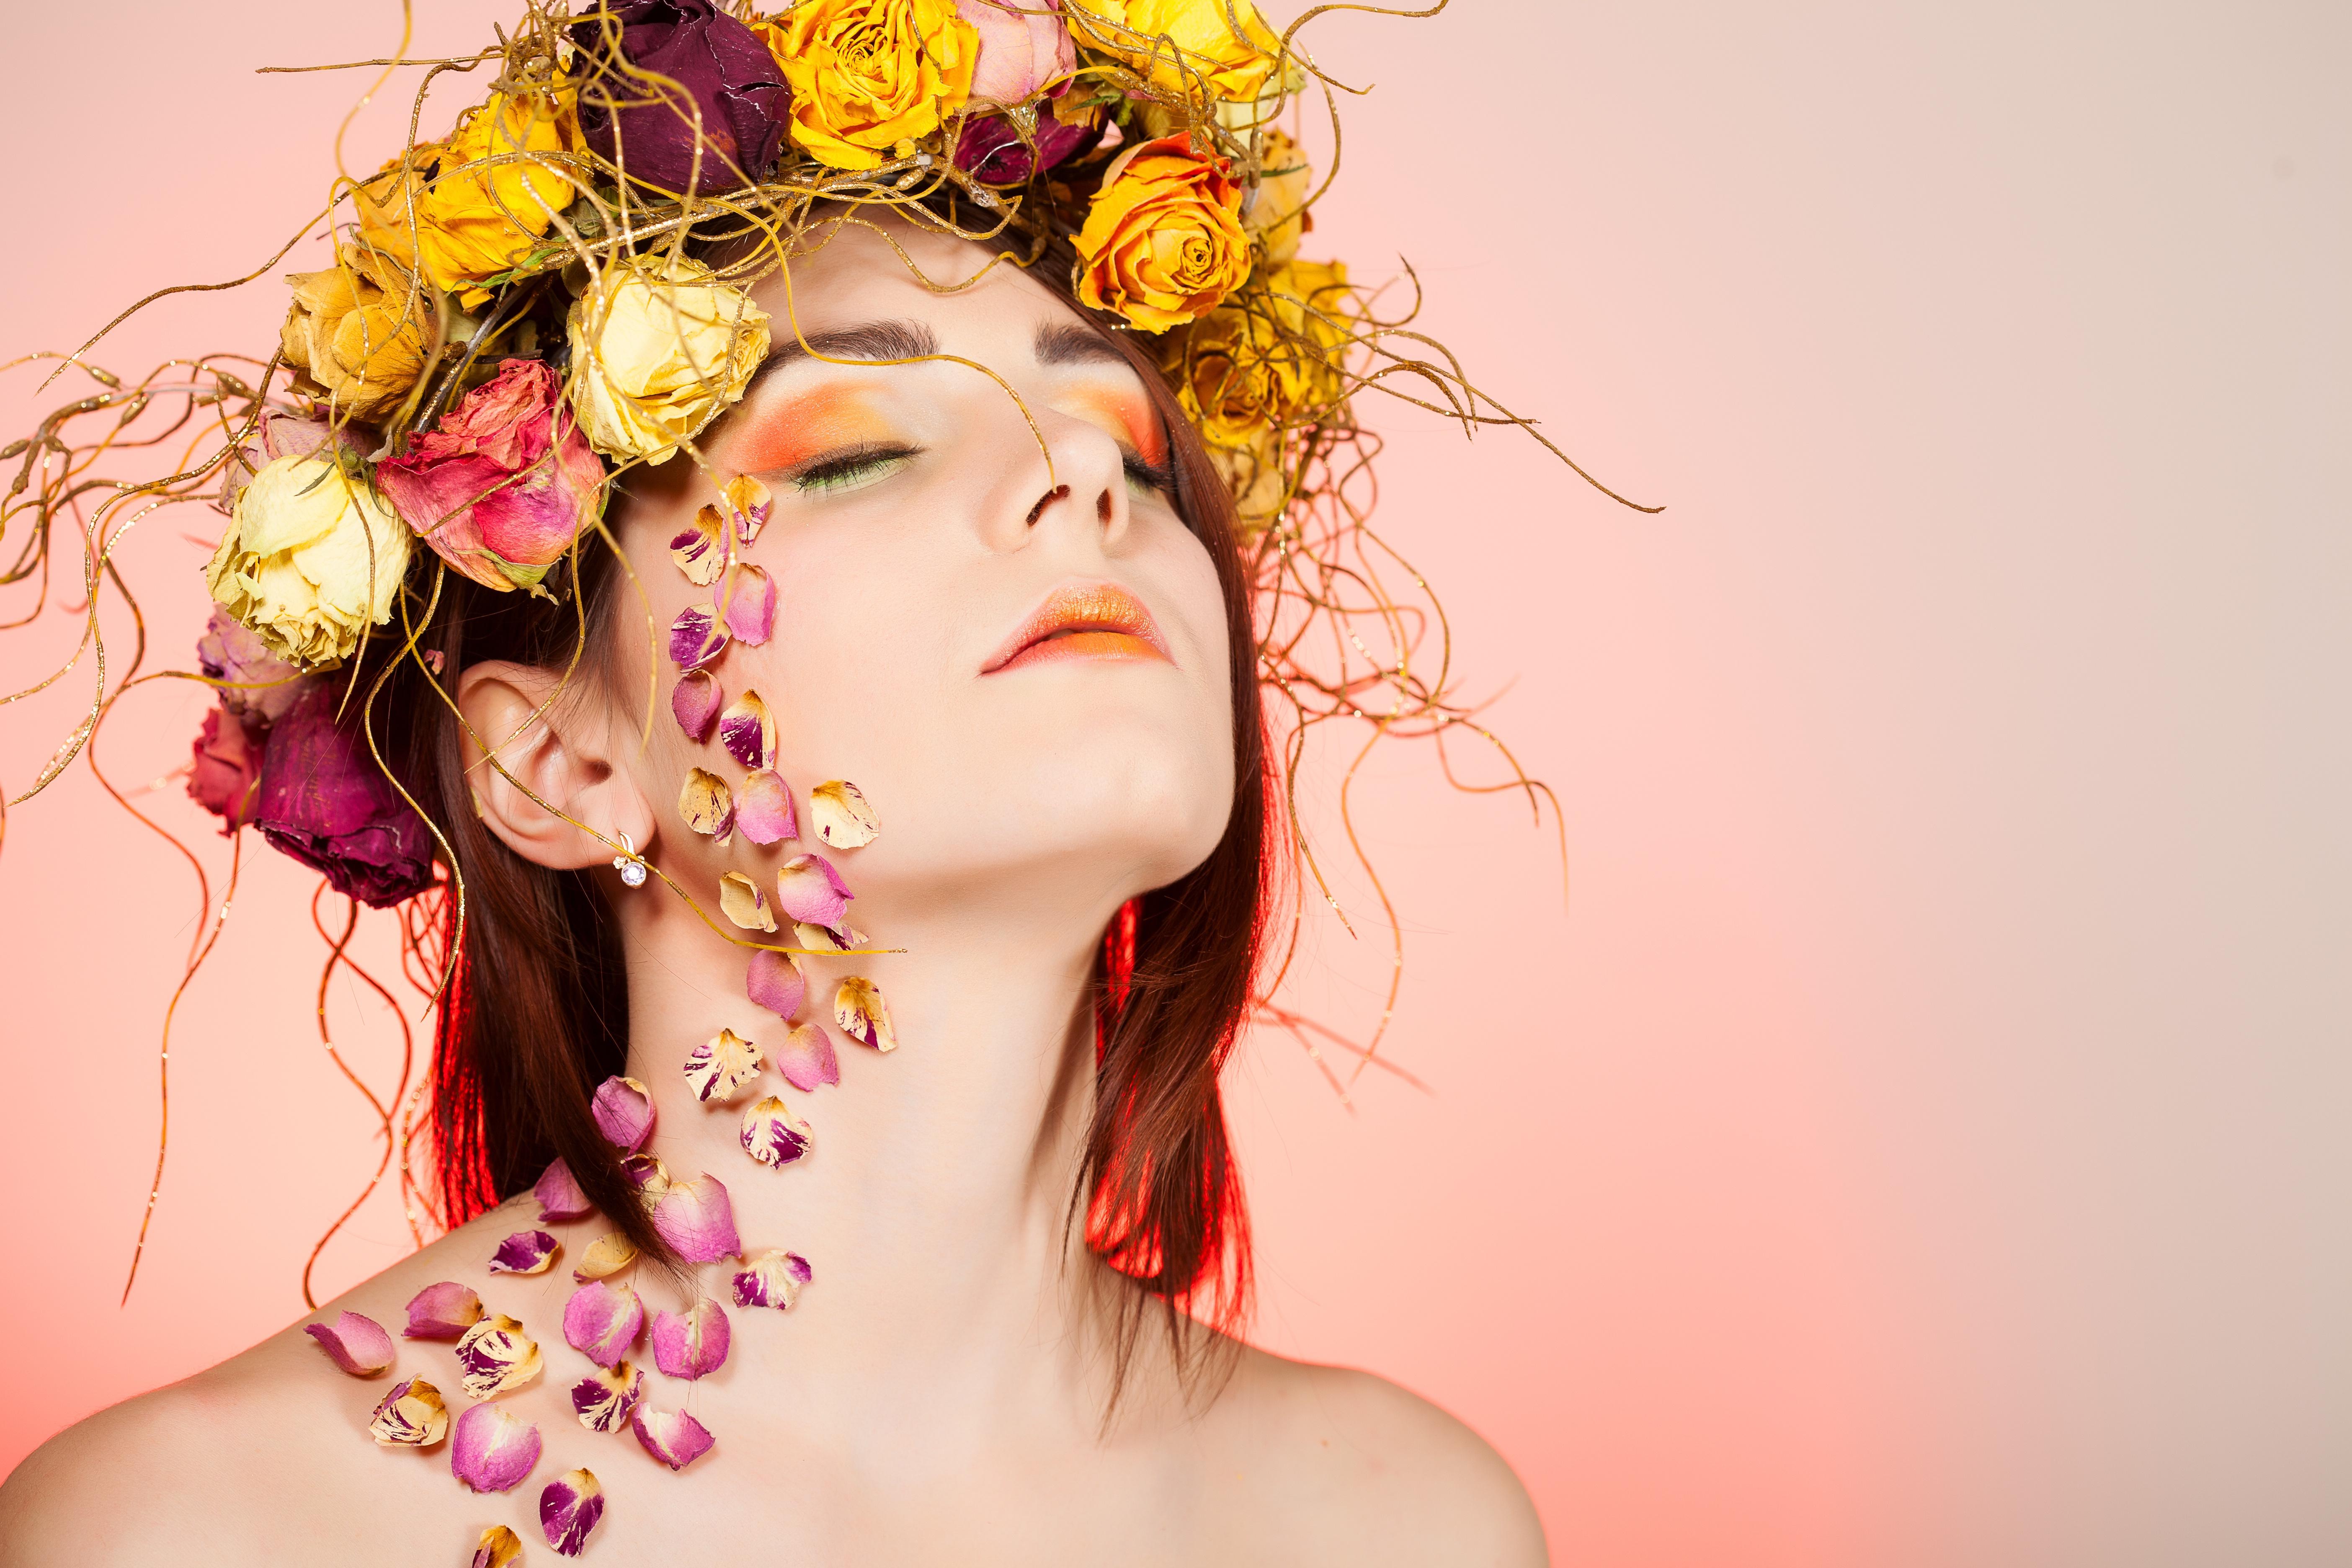 Девушка с цветами рисунок фото